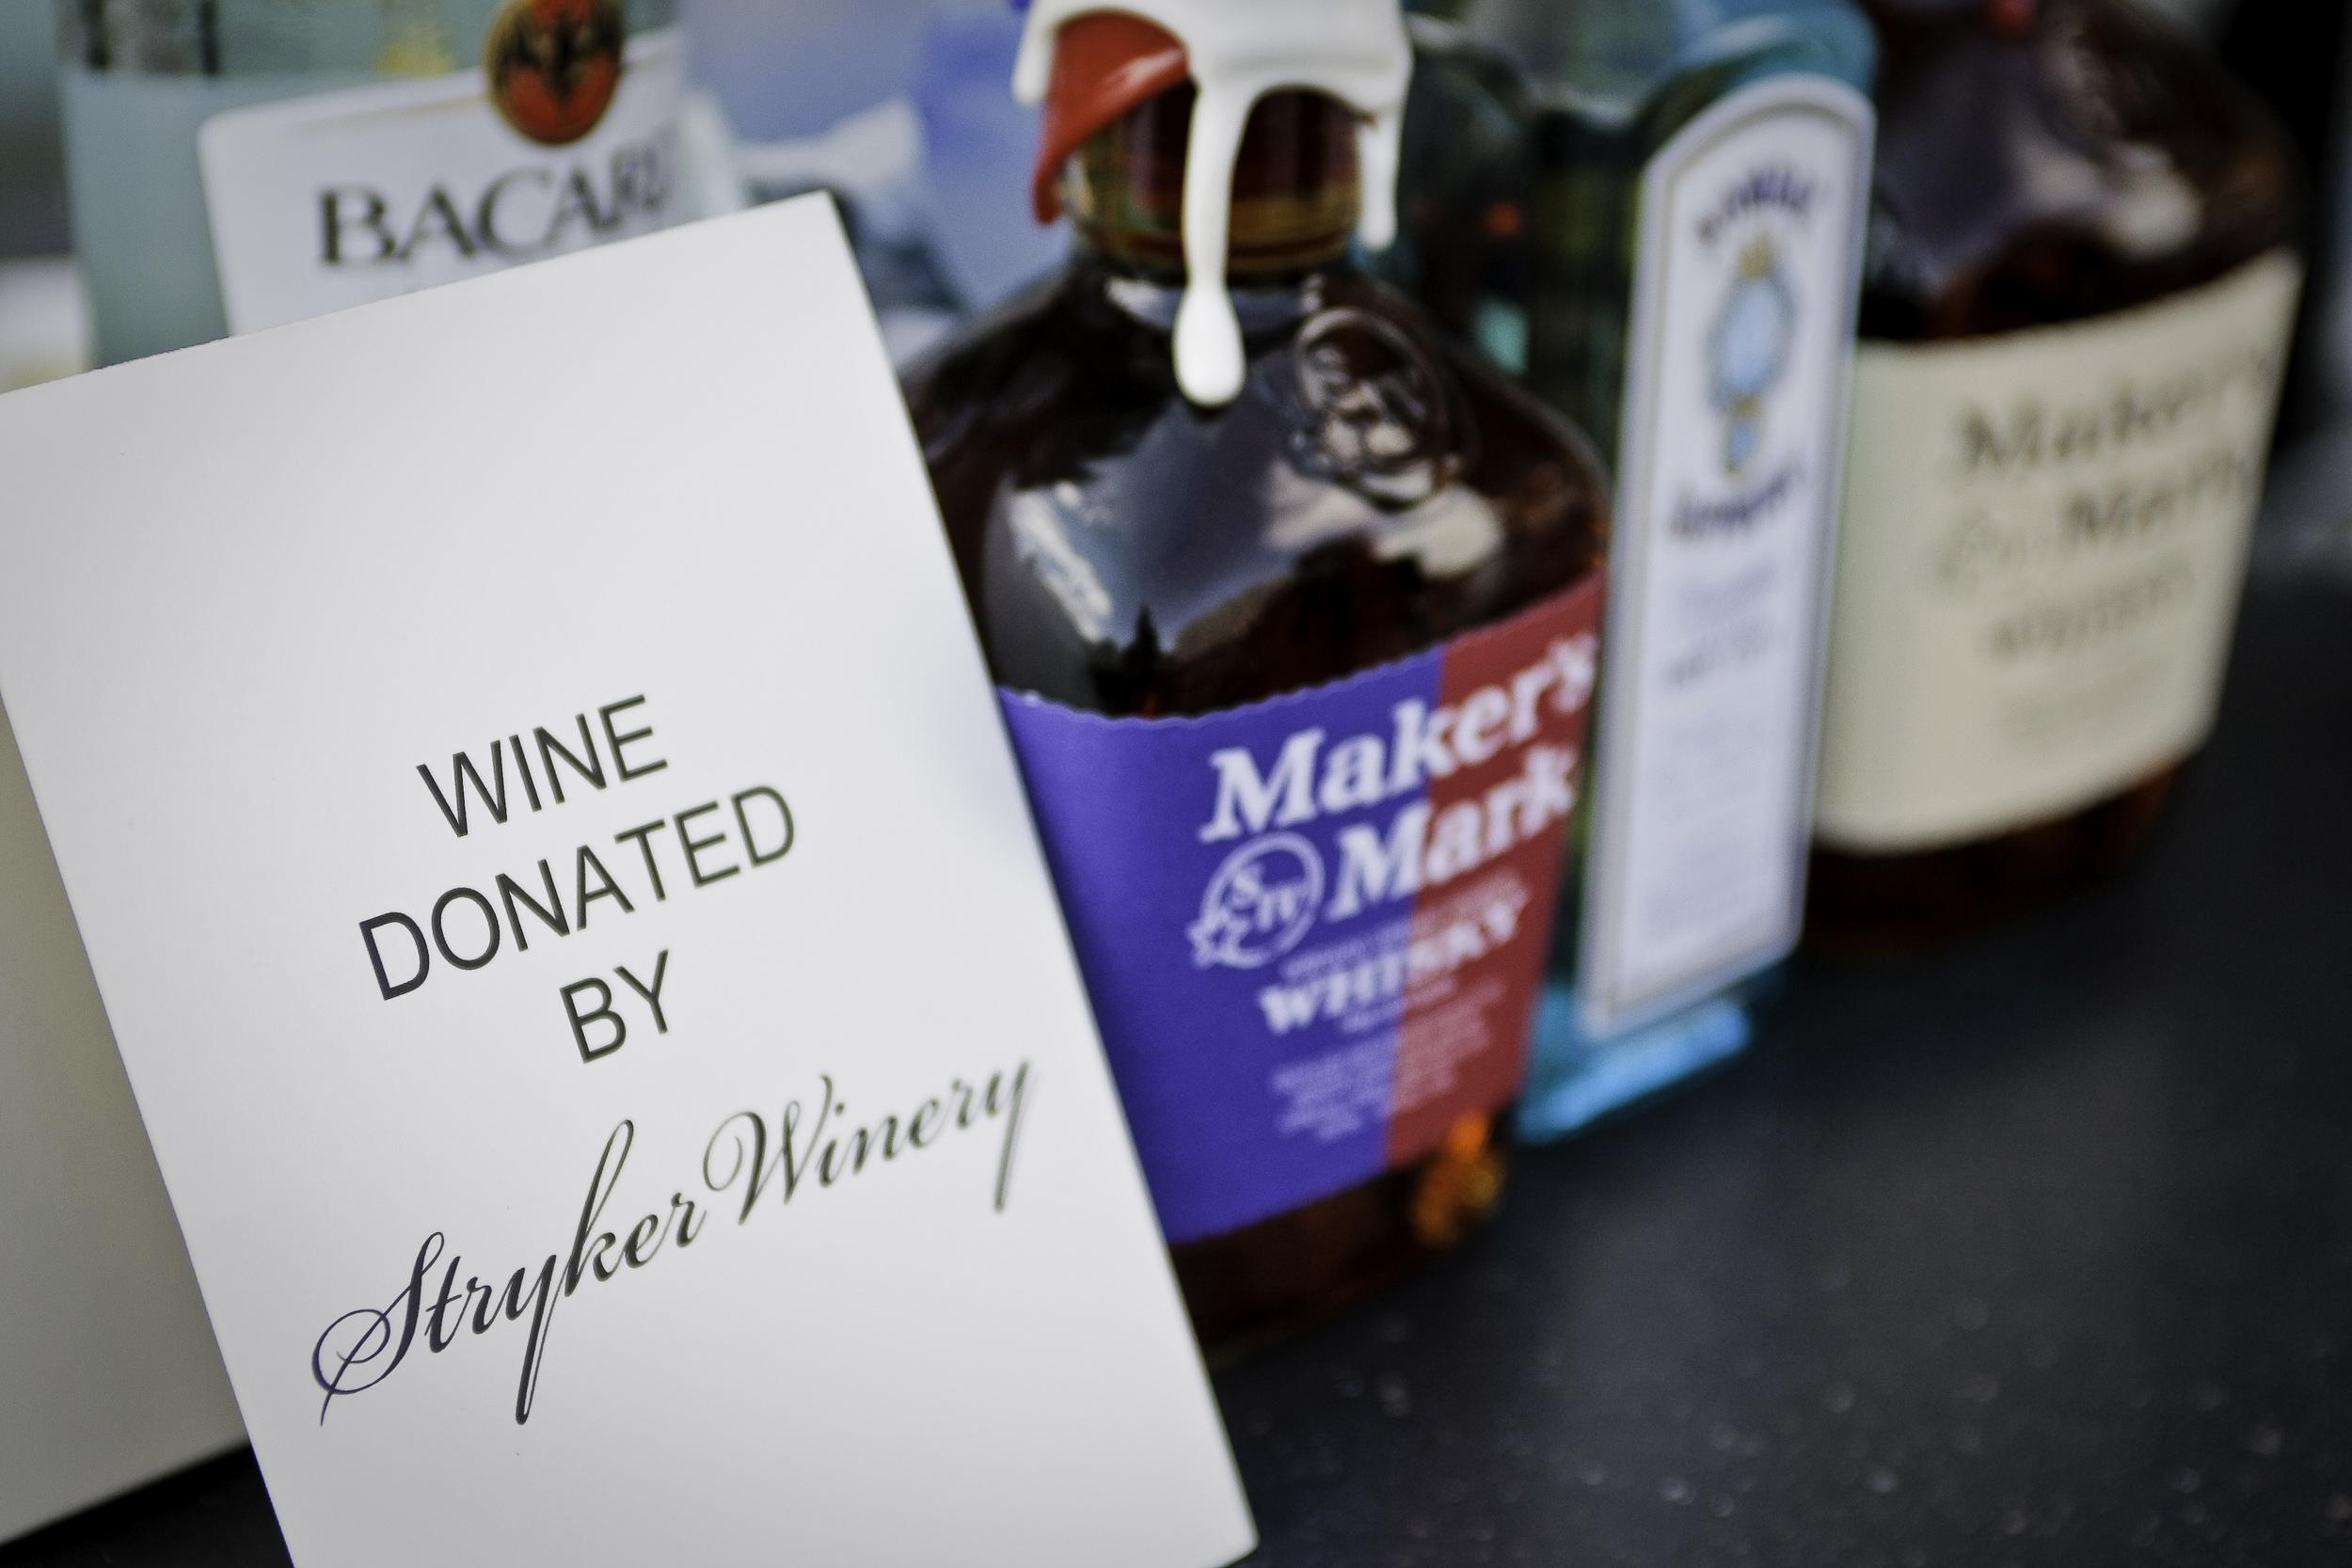 Wine Sponsorship Bar Sign